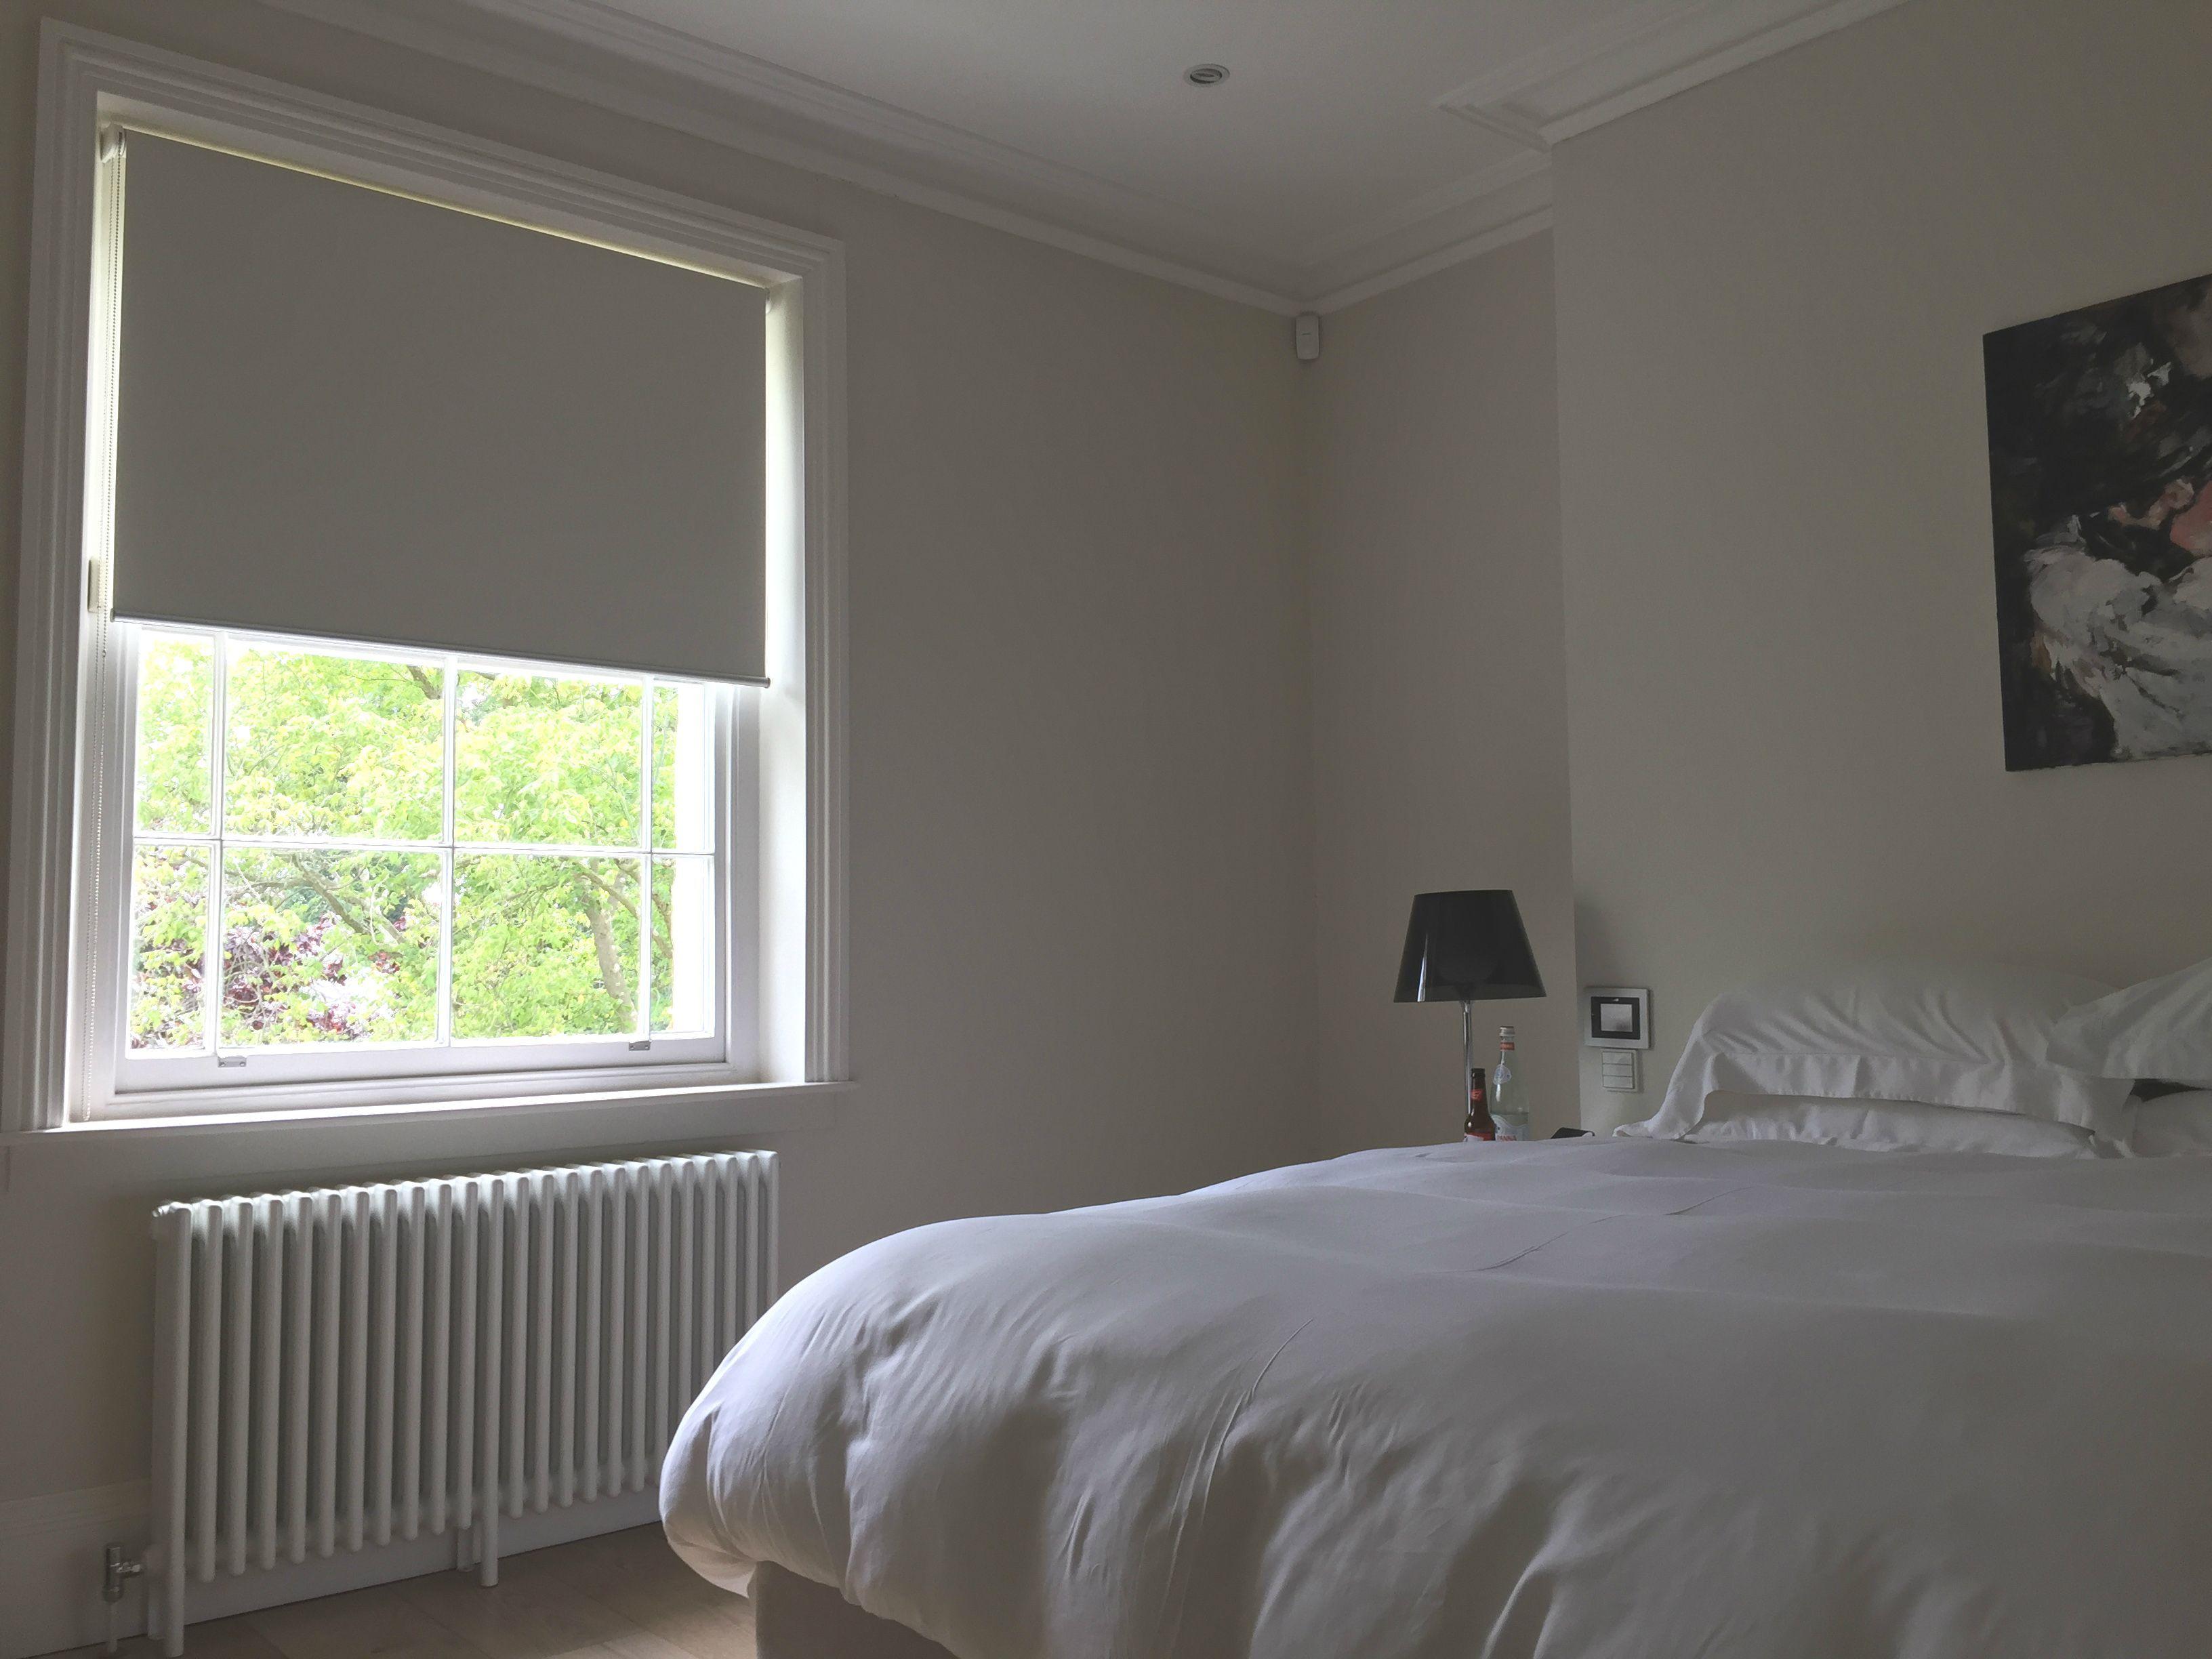 Blackout Roller Blind For Bedroom Window White Blind Sash